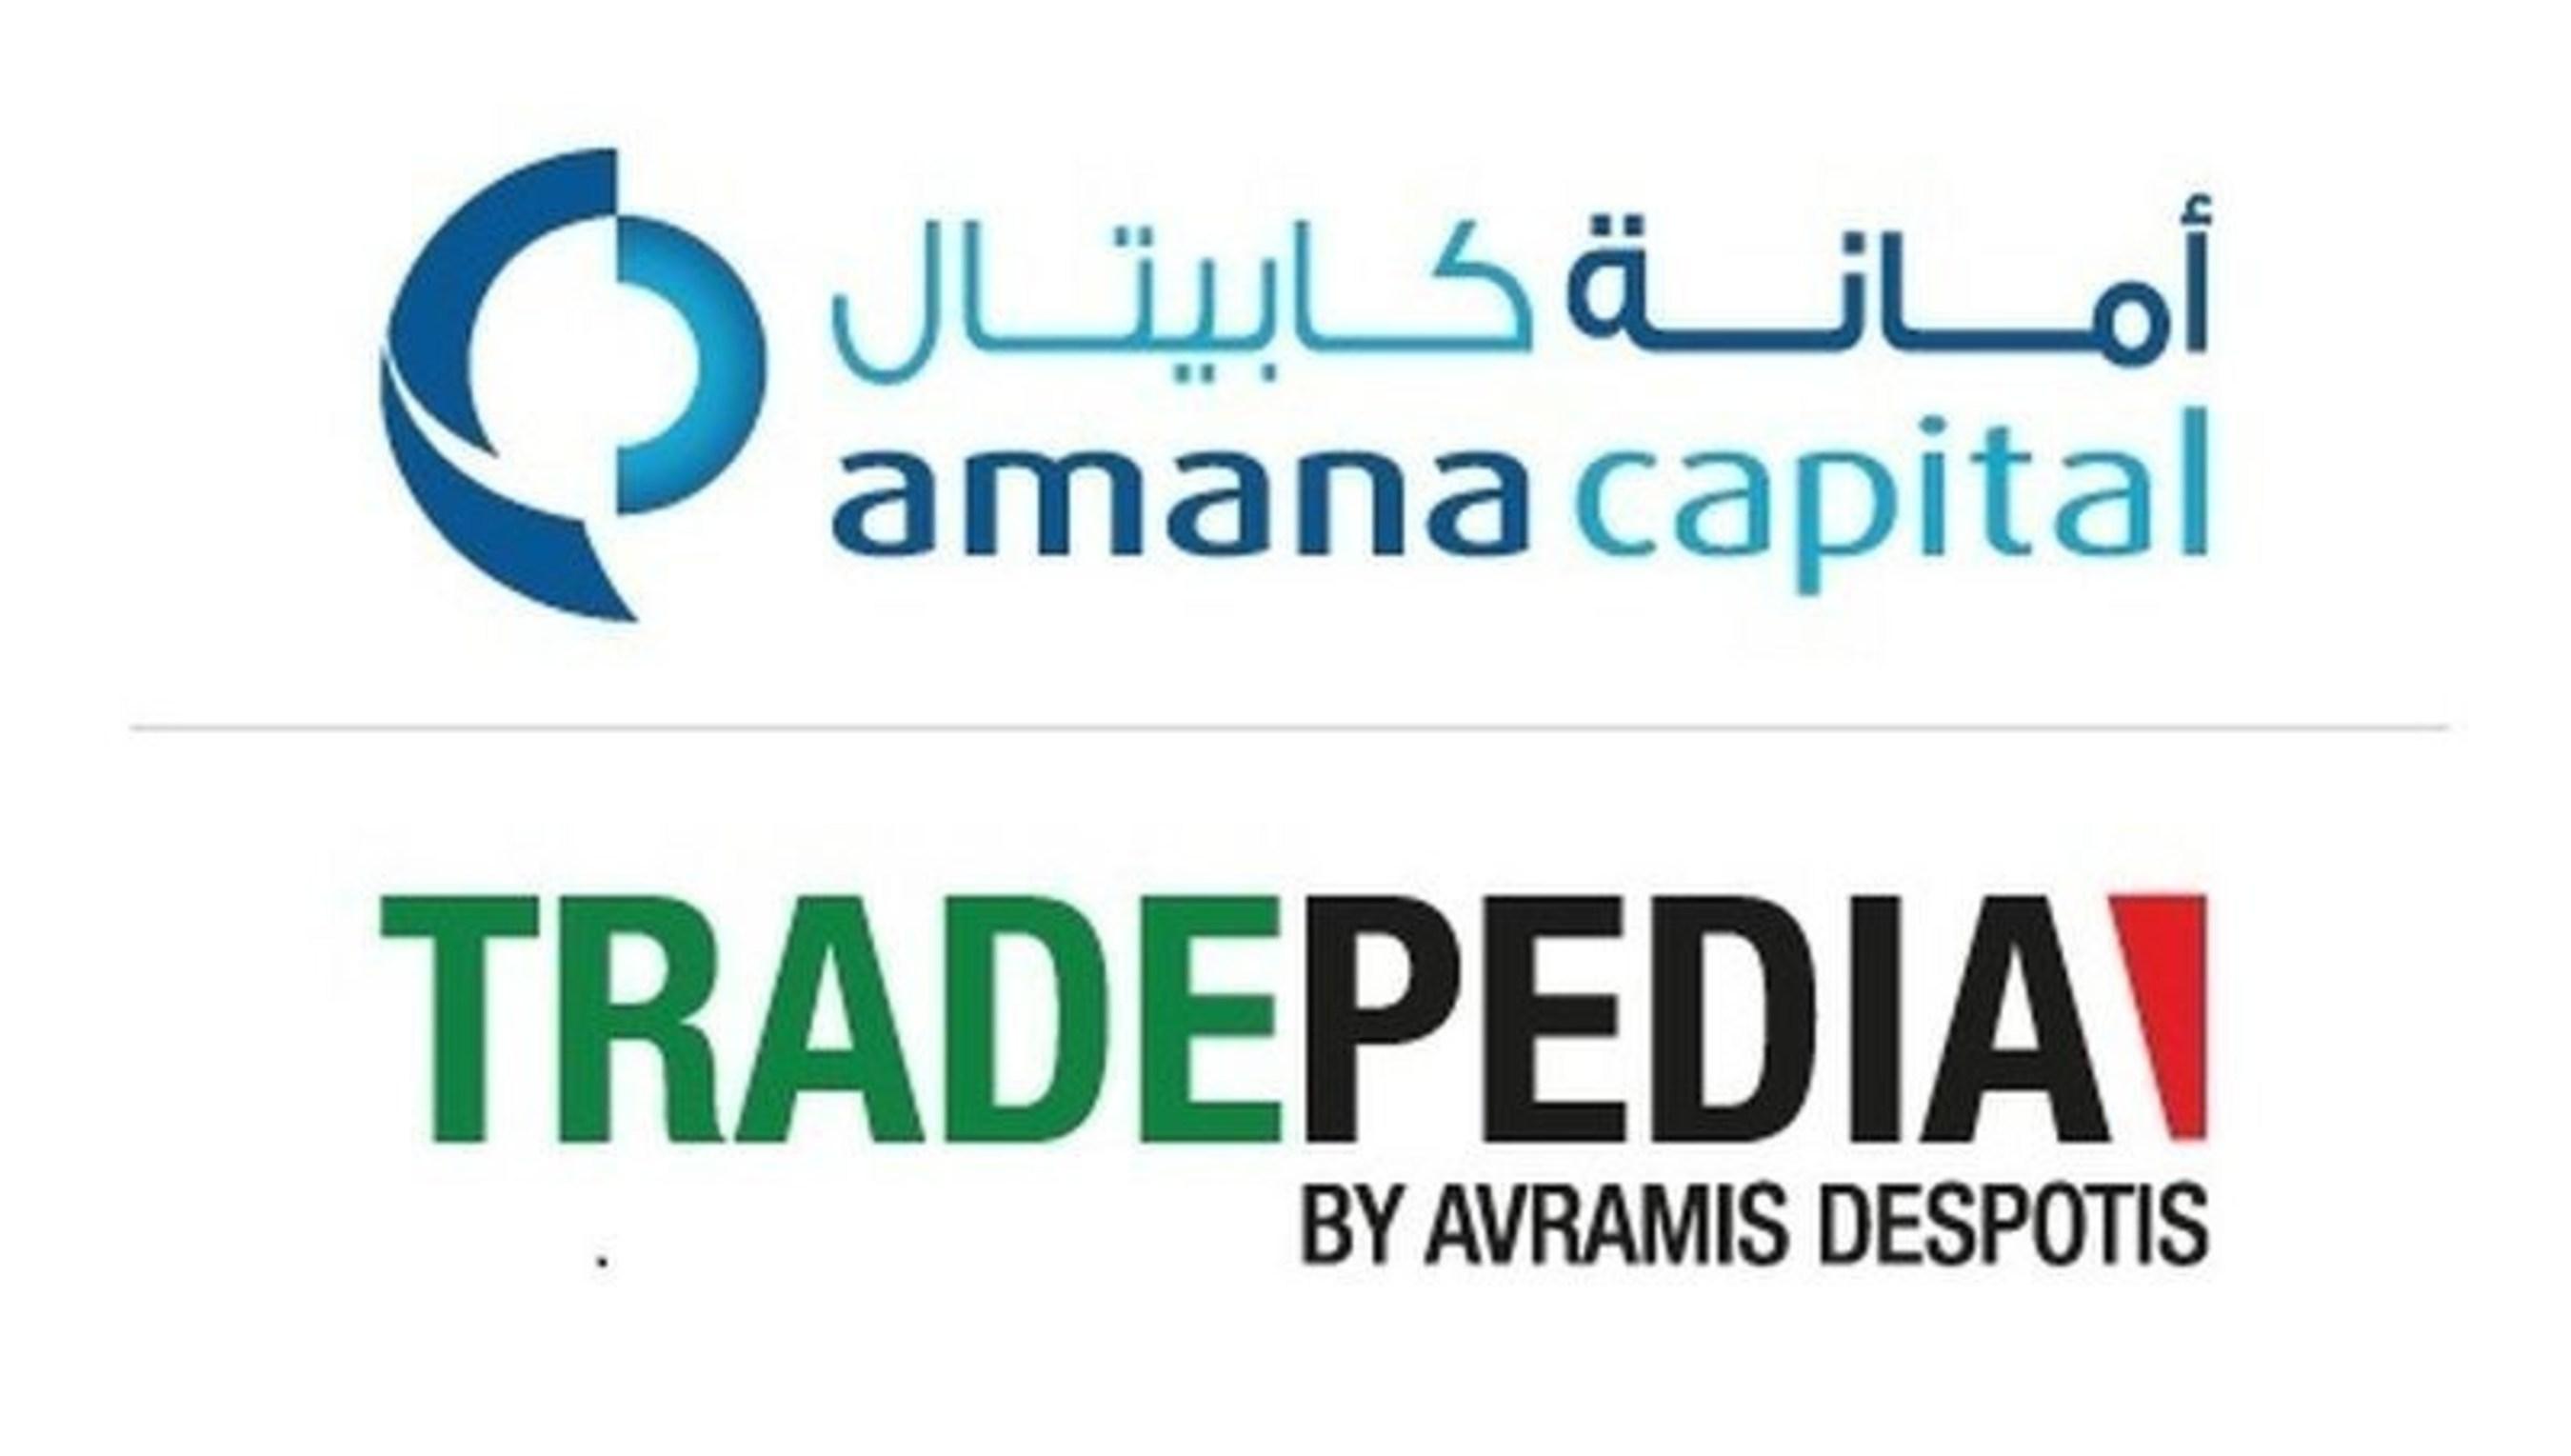 Amana Capital (PRNewsFoto/Amana Capital) (PRNewsFoto/Amana Capital)